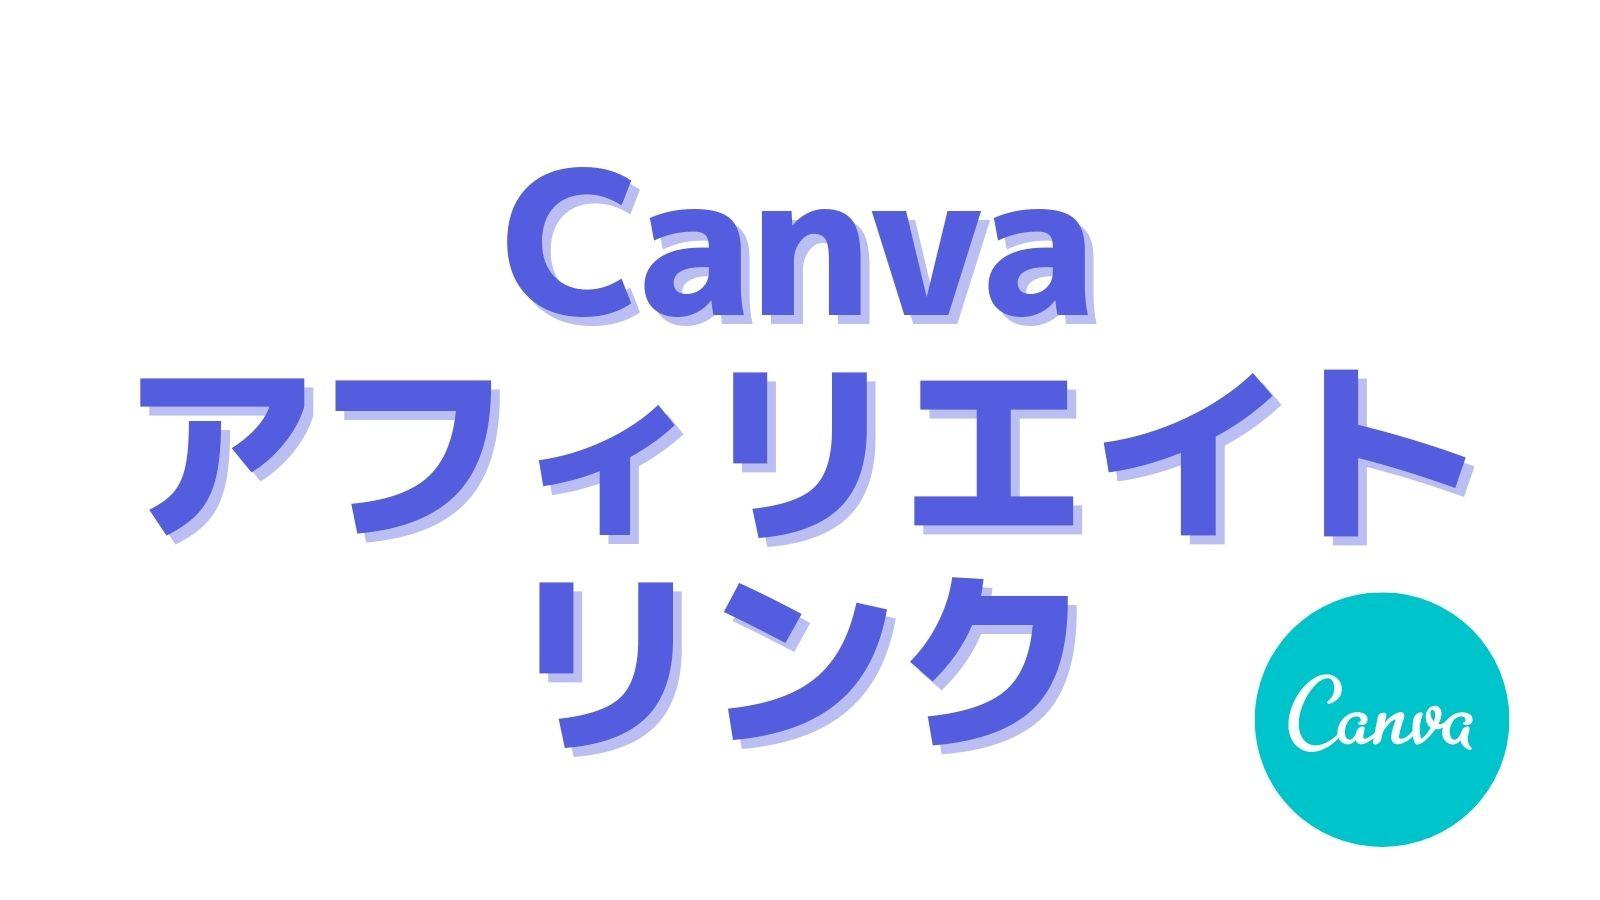 Canva_affilate (1)